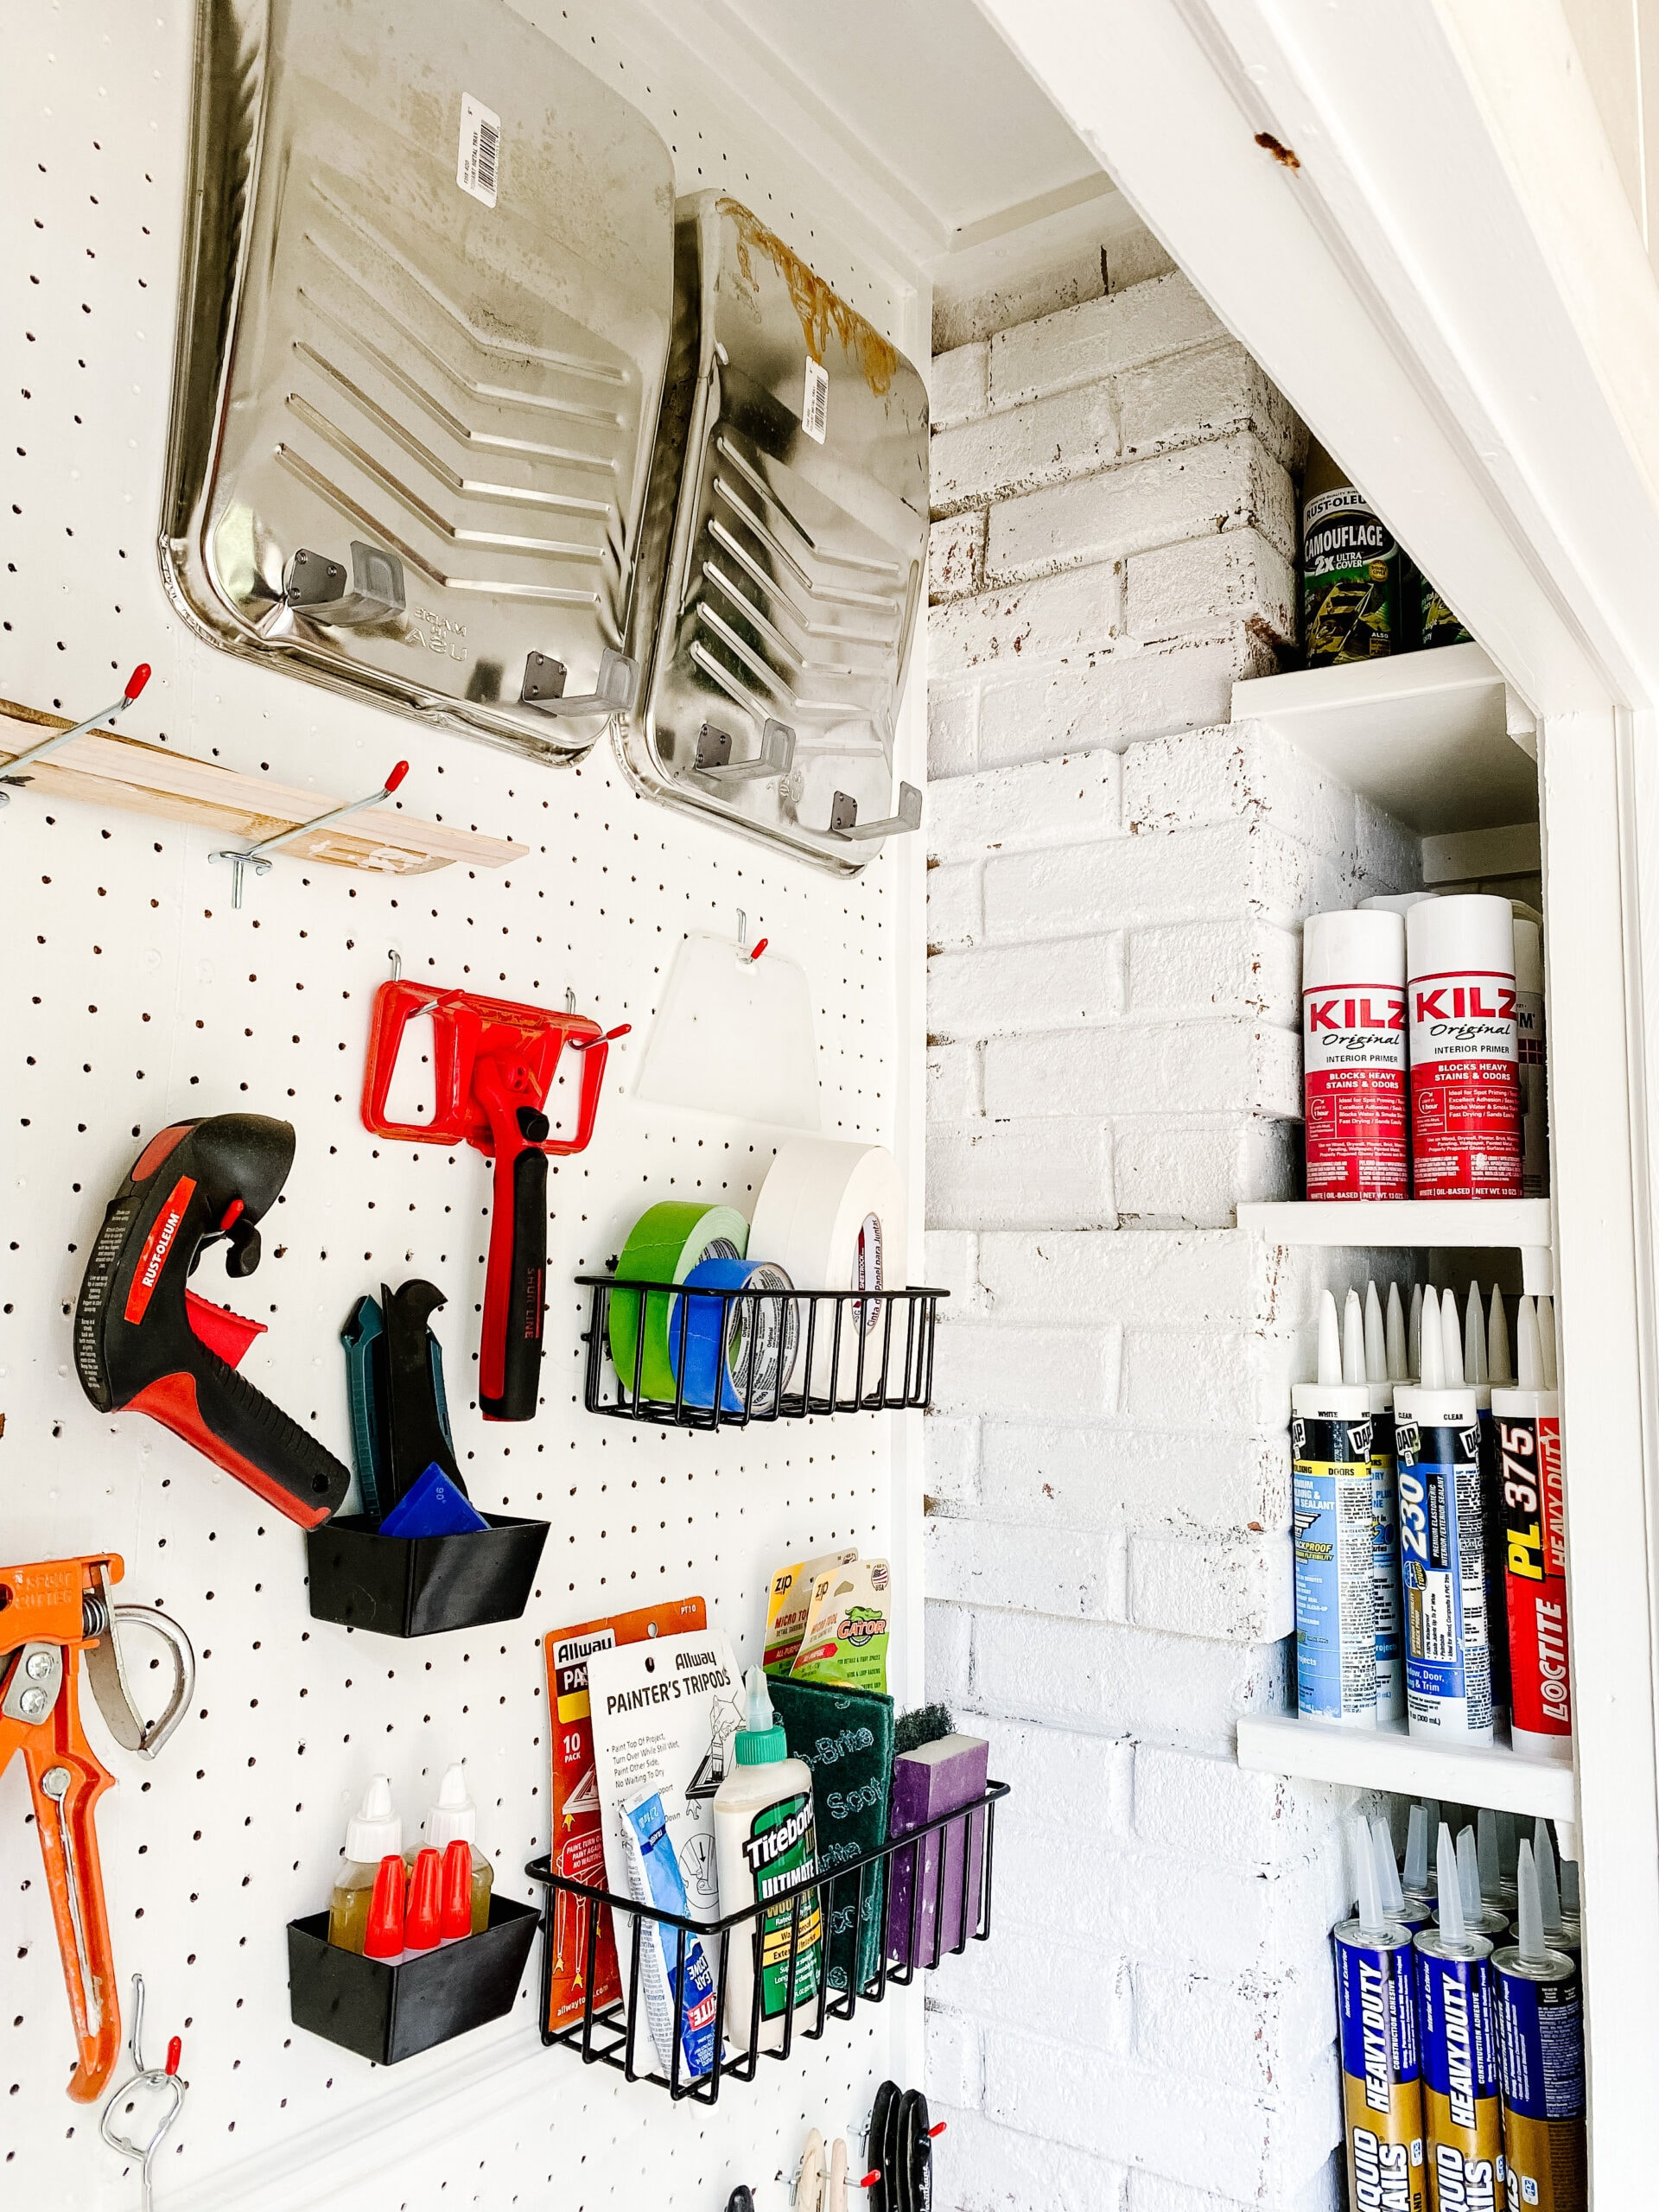 organizing spray paint storage with DIY shelves